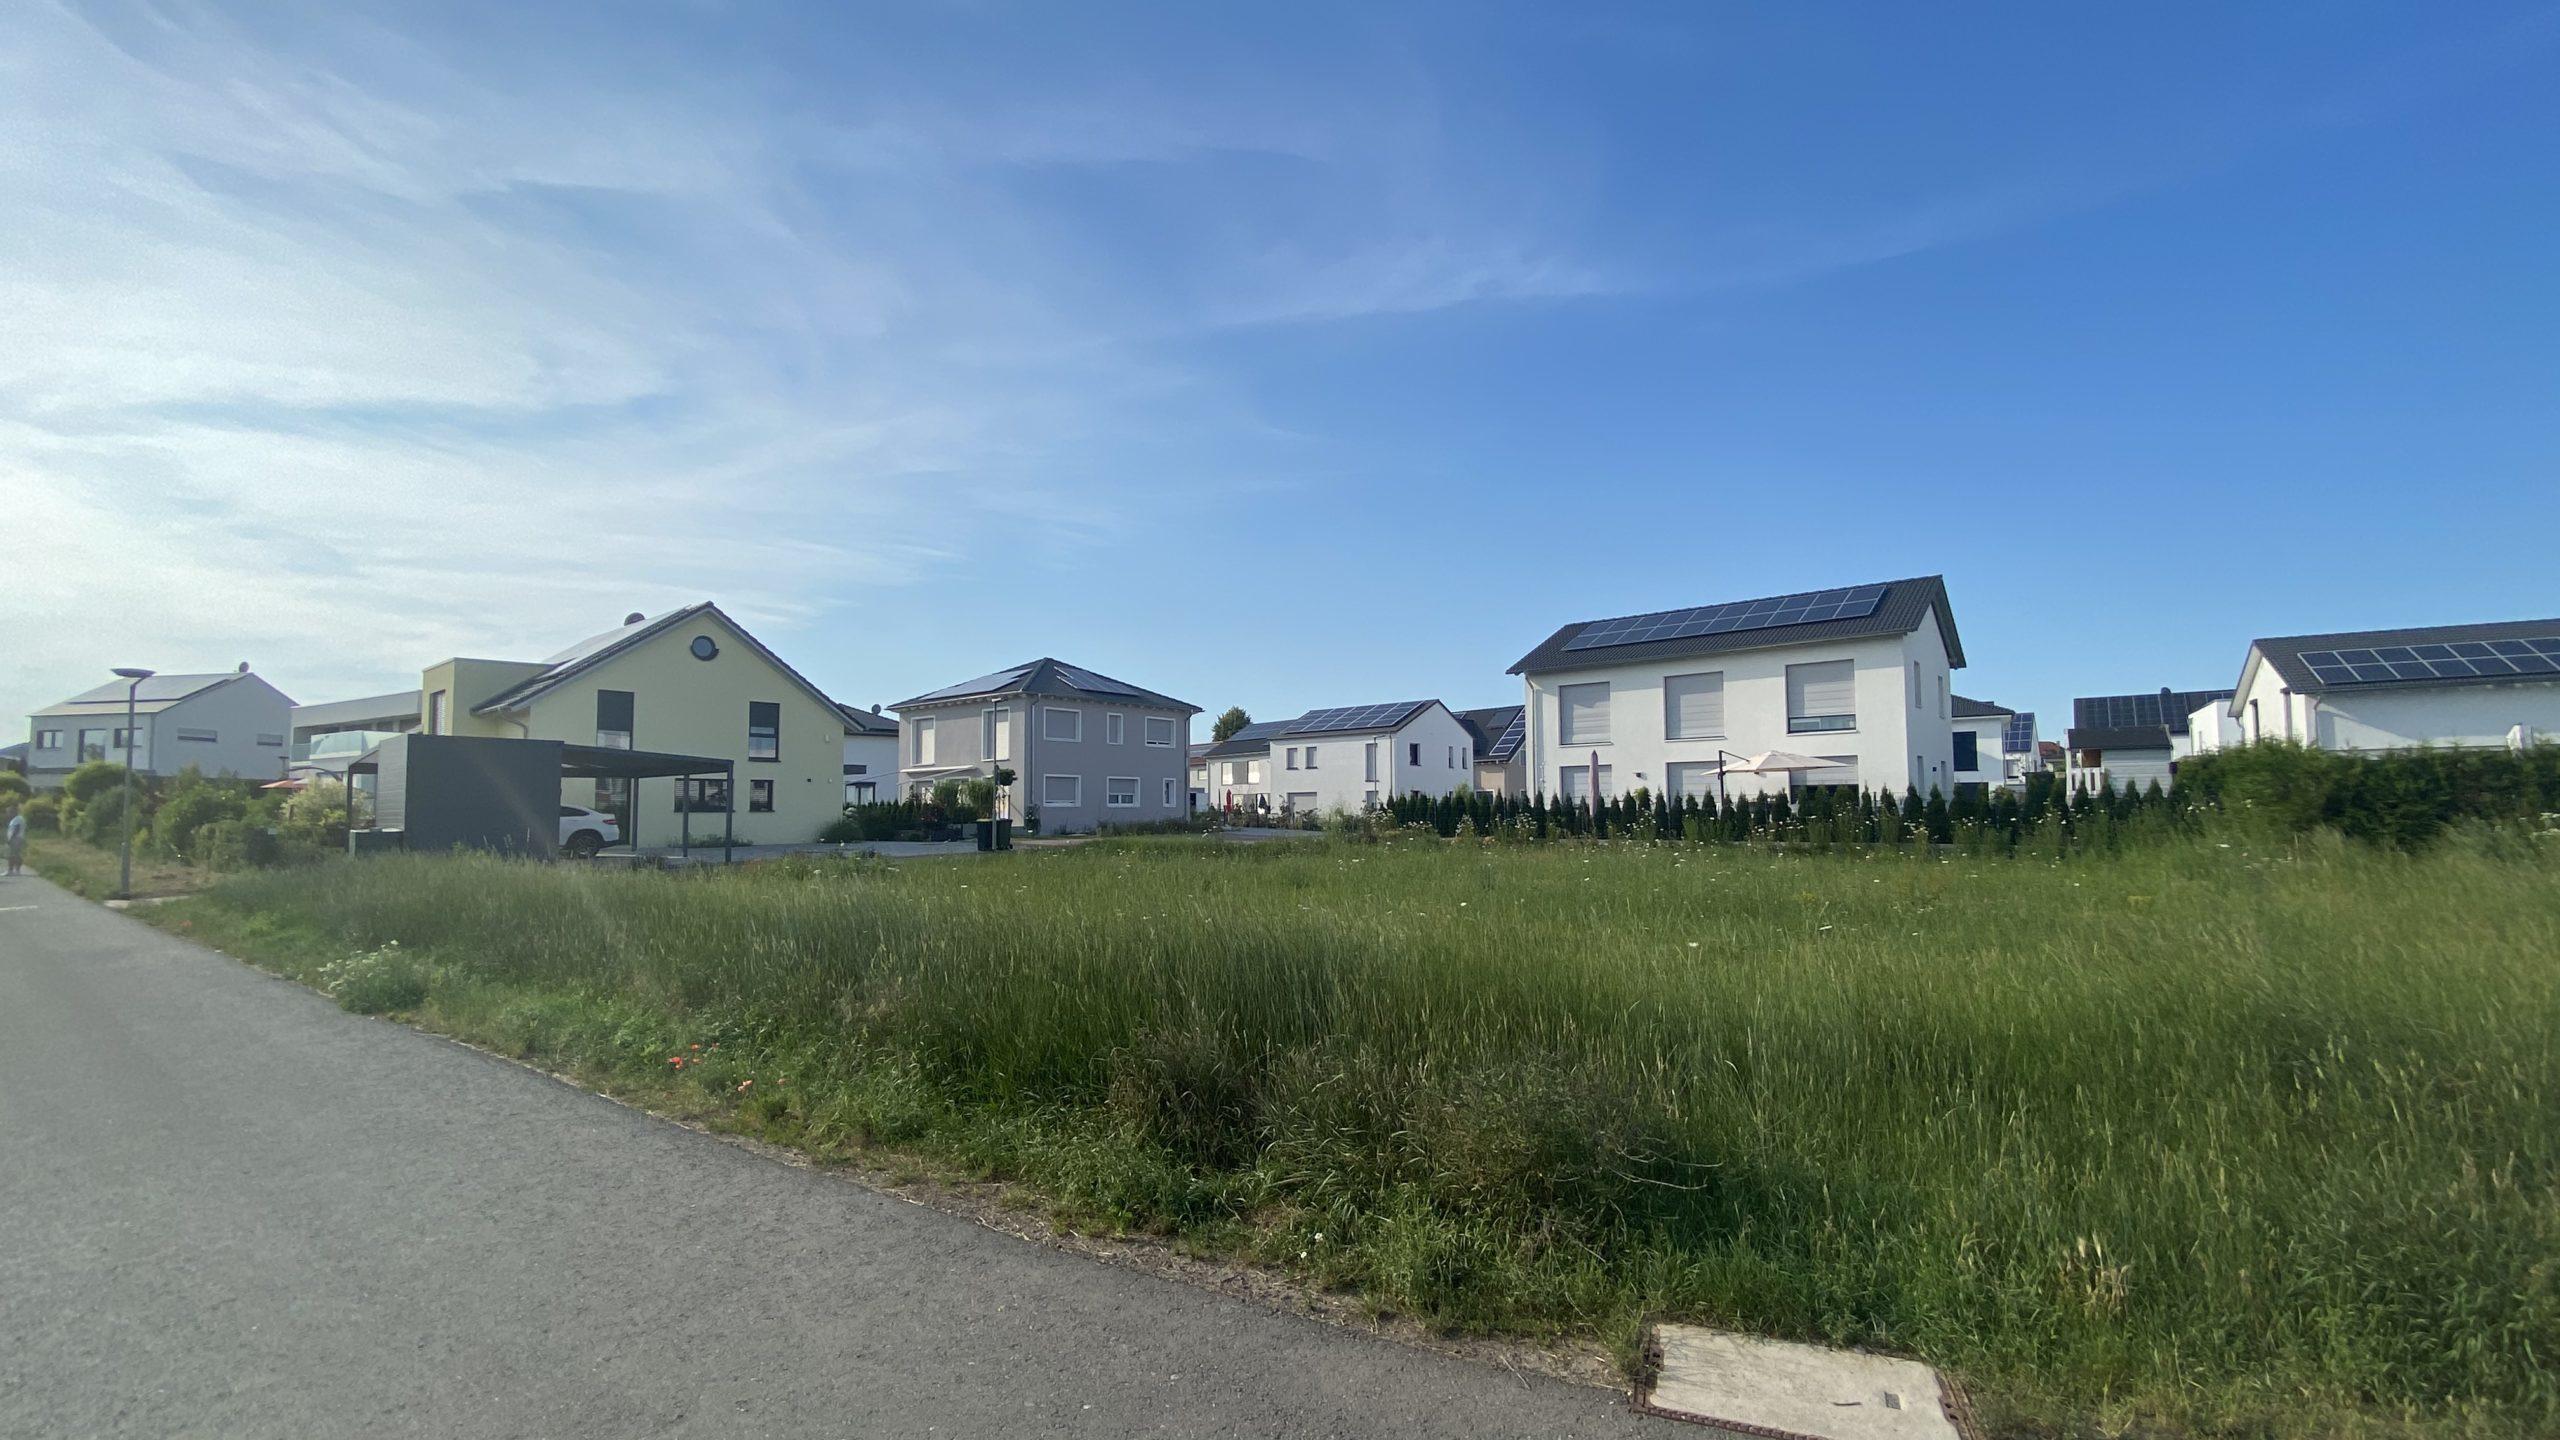 Passivhaussiedlung in Nidderau